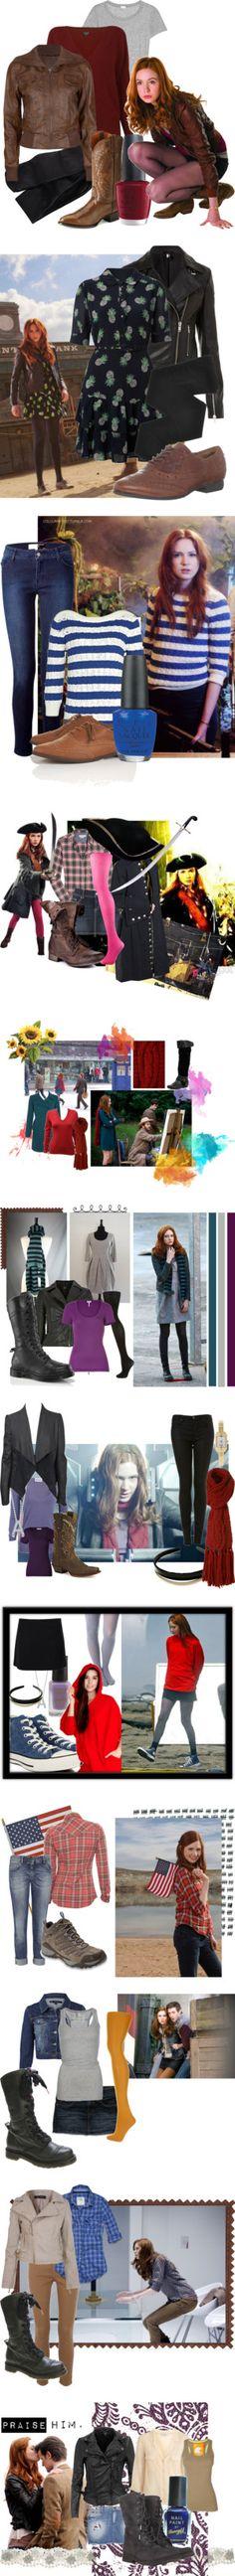 Amy Pond outfits. by ponderland on Polyvore featuring H&M, Splendid, Jaeger, Full Tilt, Nocona, OPI, amy pond, doctor who, karen gillan and Whistles